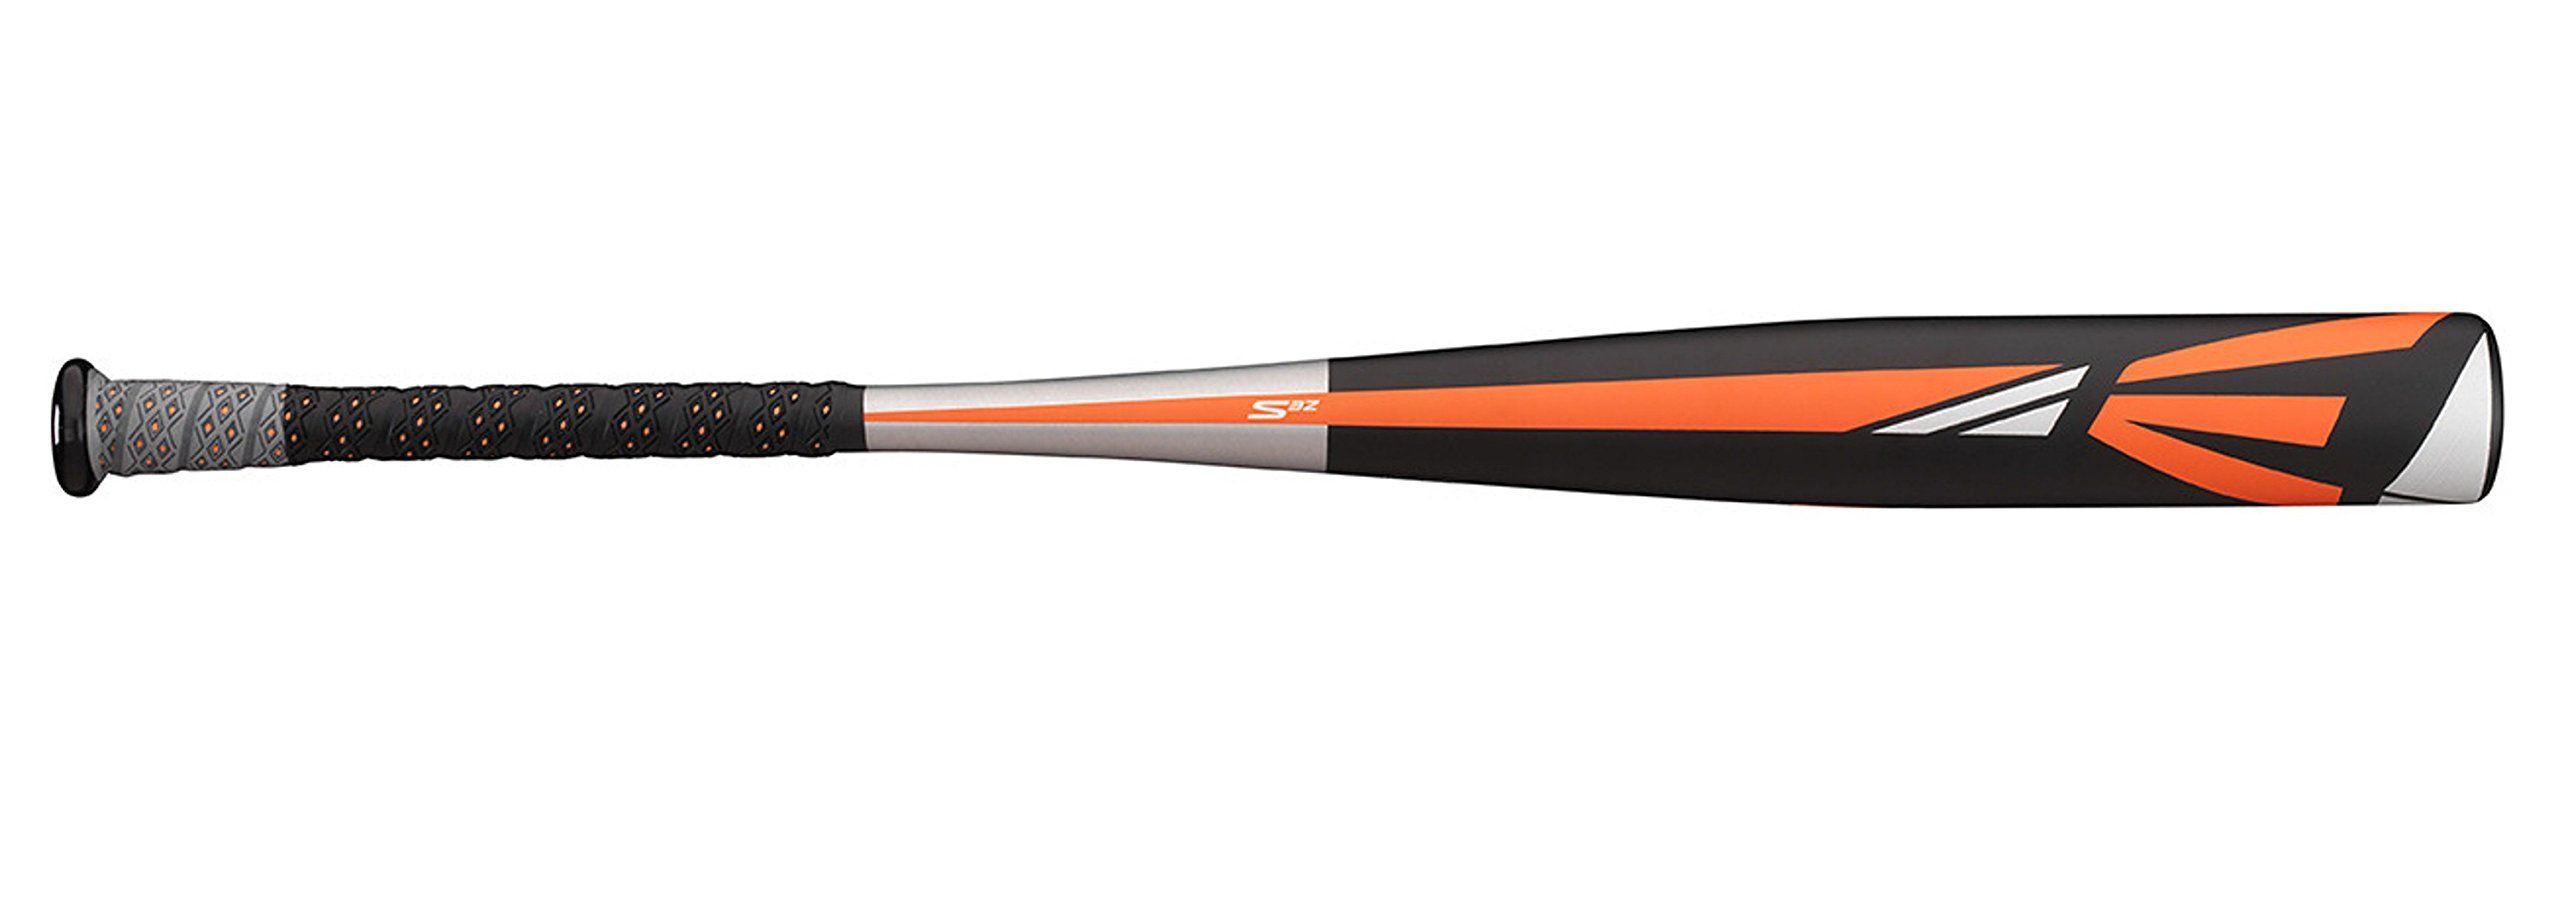 Easton 2015 Bb15s3z S3z Zcore 3 Bbcor Baseball Bat 33 Inch 30 Ounce Baseball Bat Baseball Easton Bats